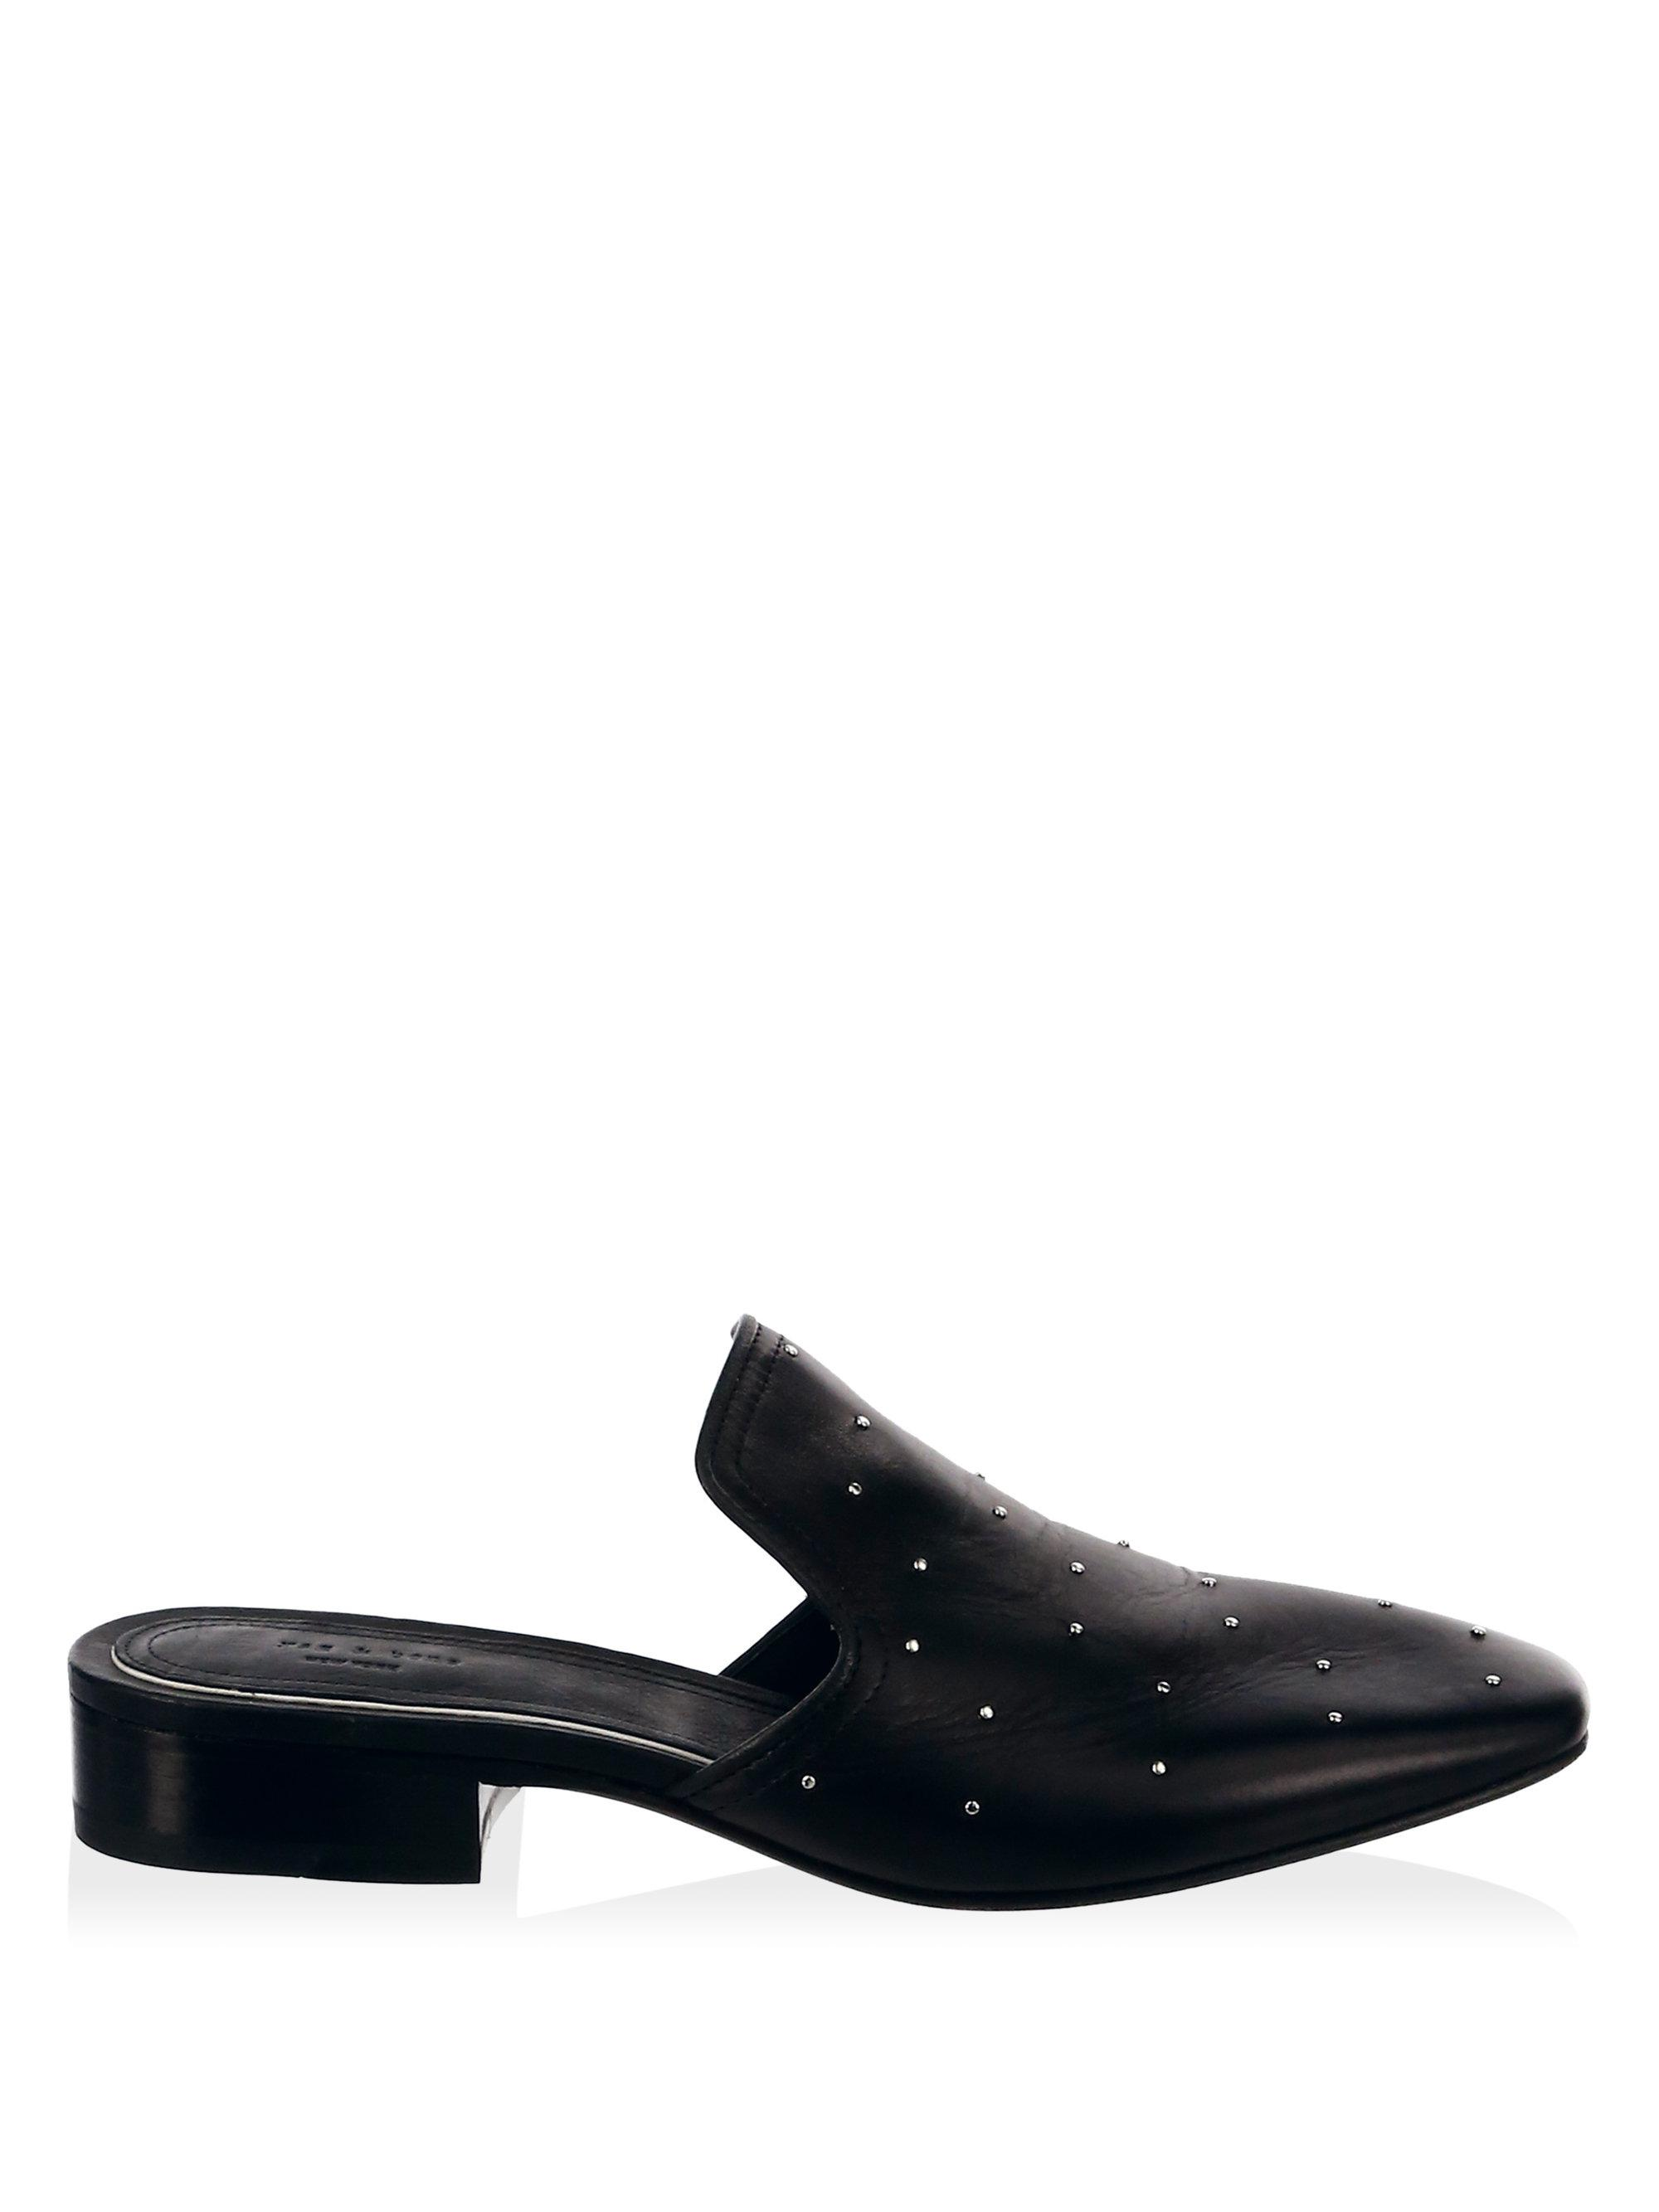 RAG&BONE Luis Studded Leather Loafers tUx1ue1K